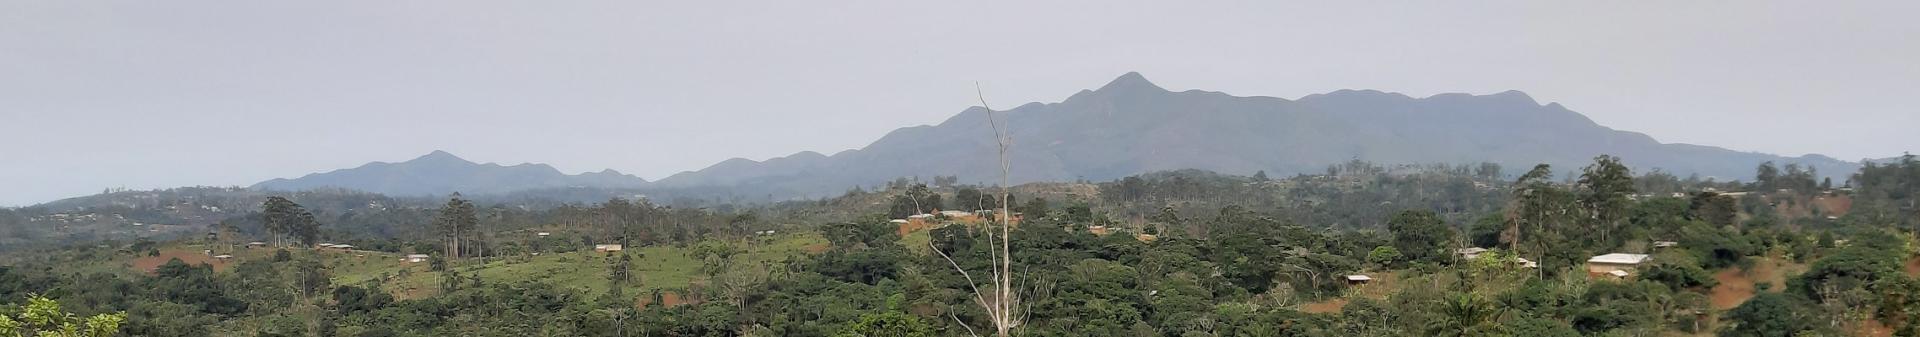 Panorama batchingou